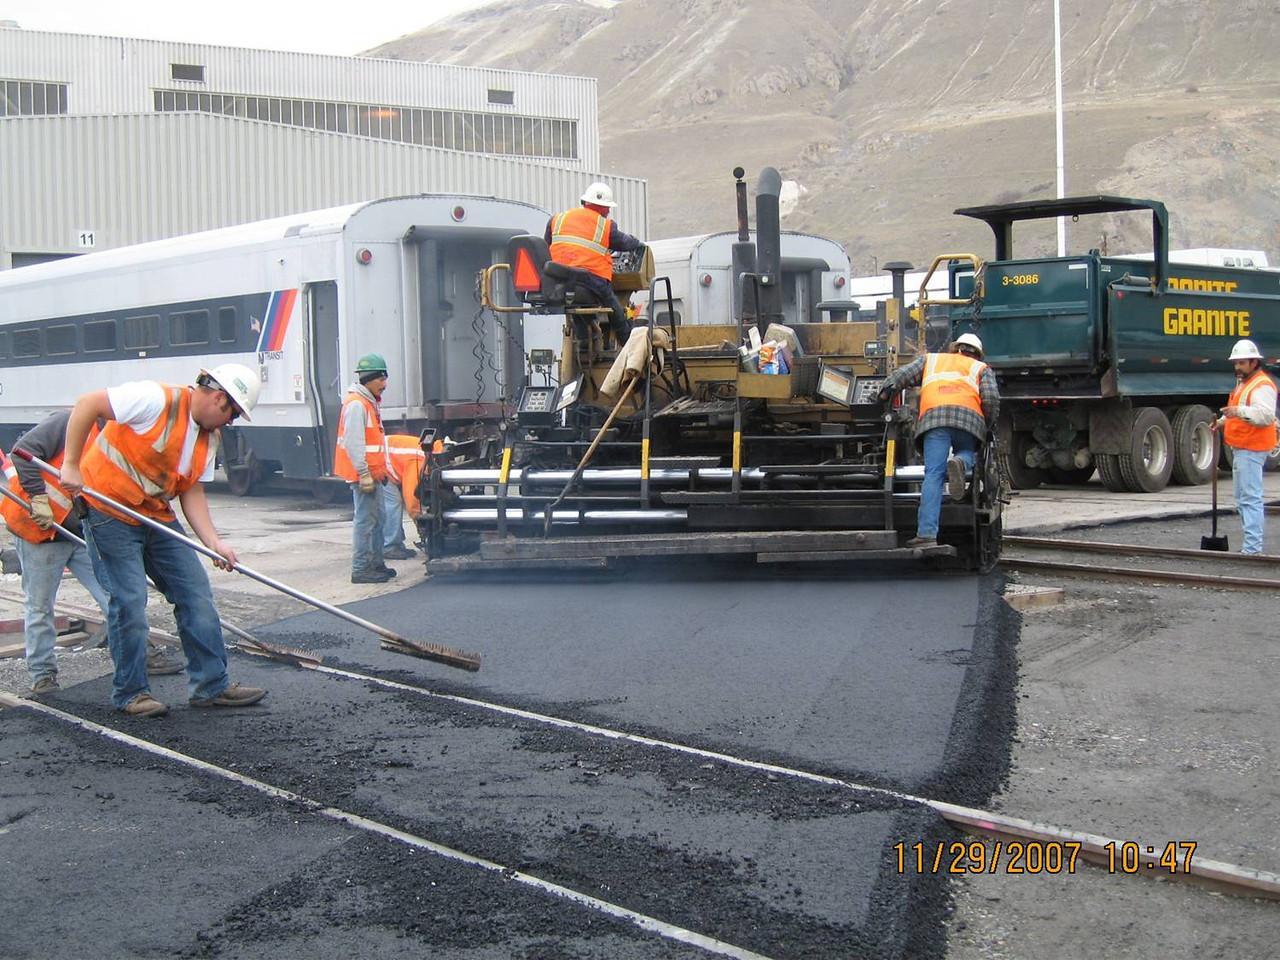 2007-11nov-29_Salt_Lake_City_Warm_Springs_Shop_Access_Road_Paving_002